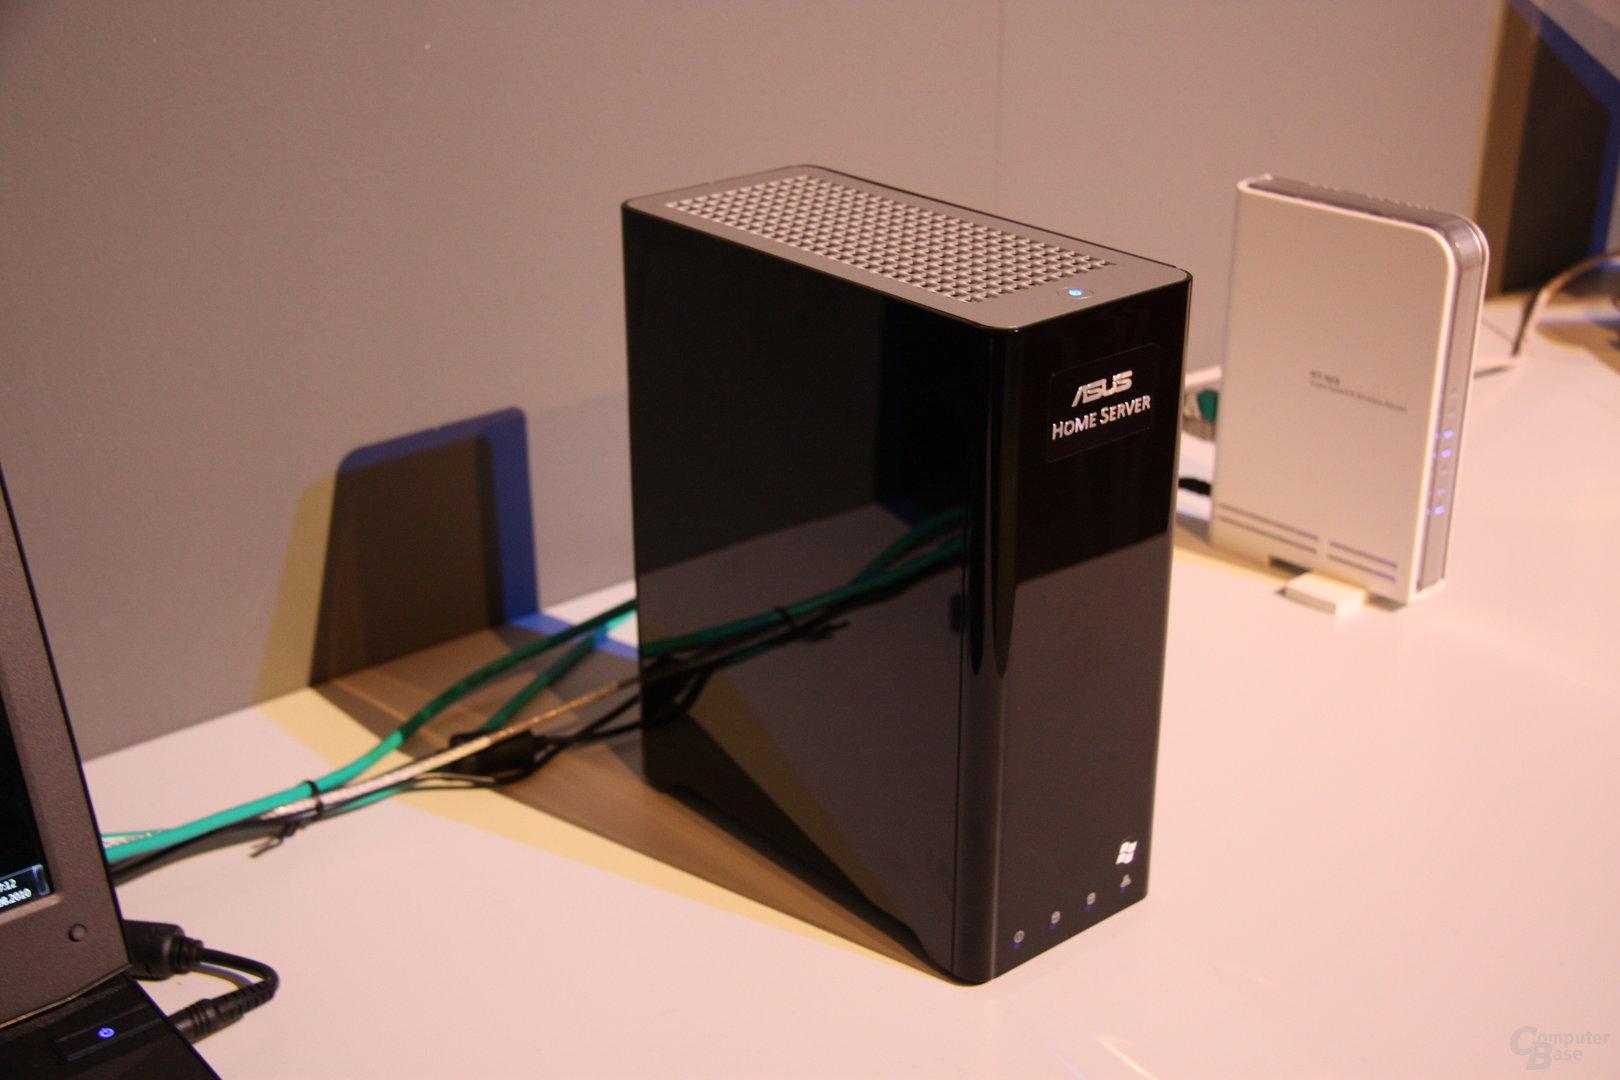 Asus auf der Gamescom 2010